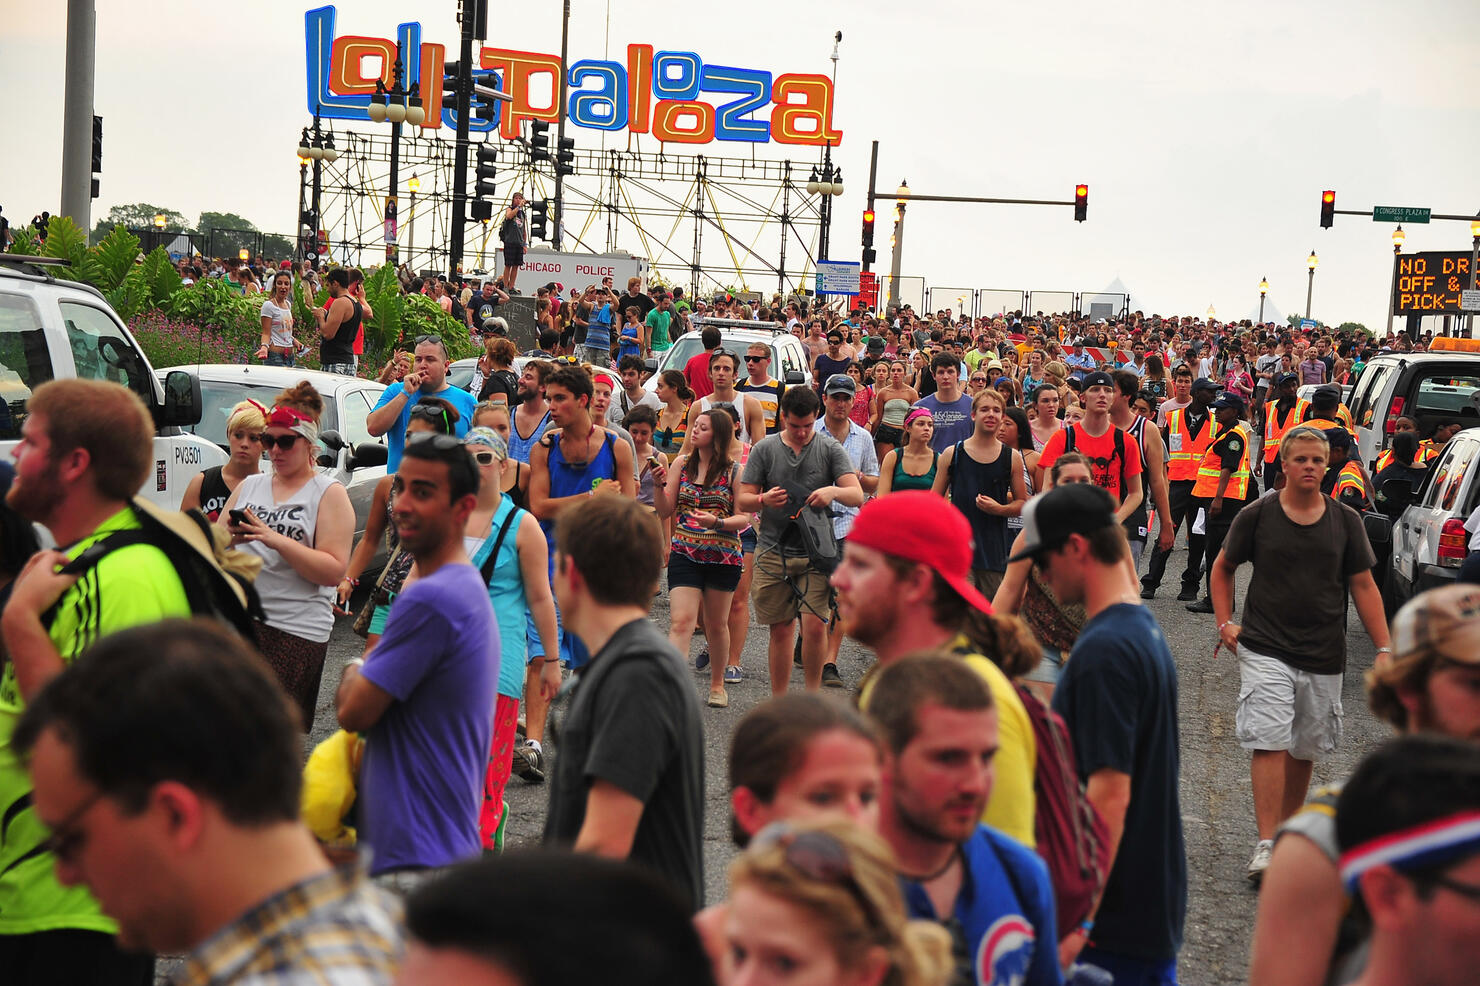 2012 Lollapalooza - Day 2